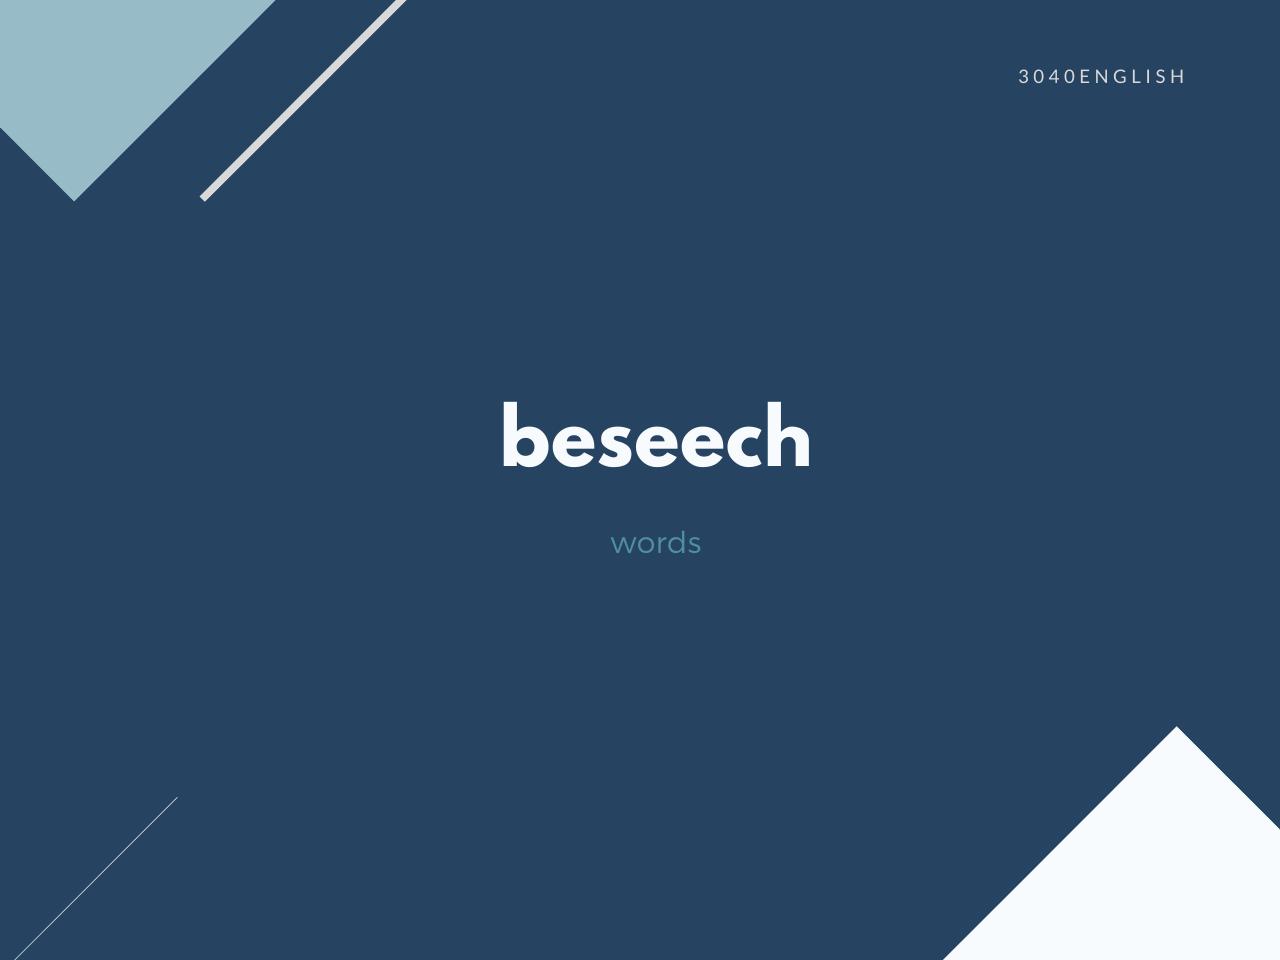 beseech の意味と簡単な使い方【音読用例文あり】